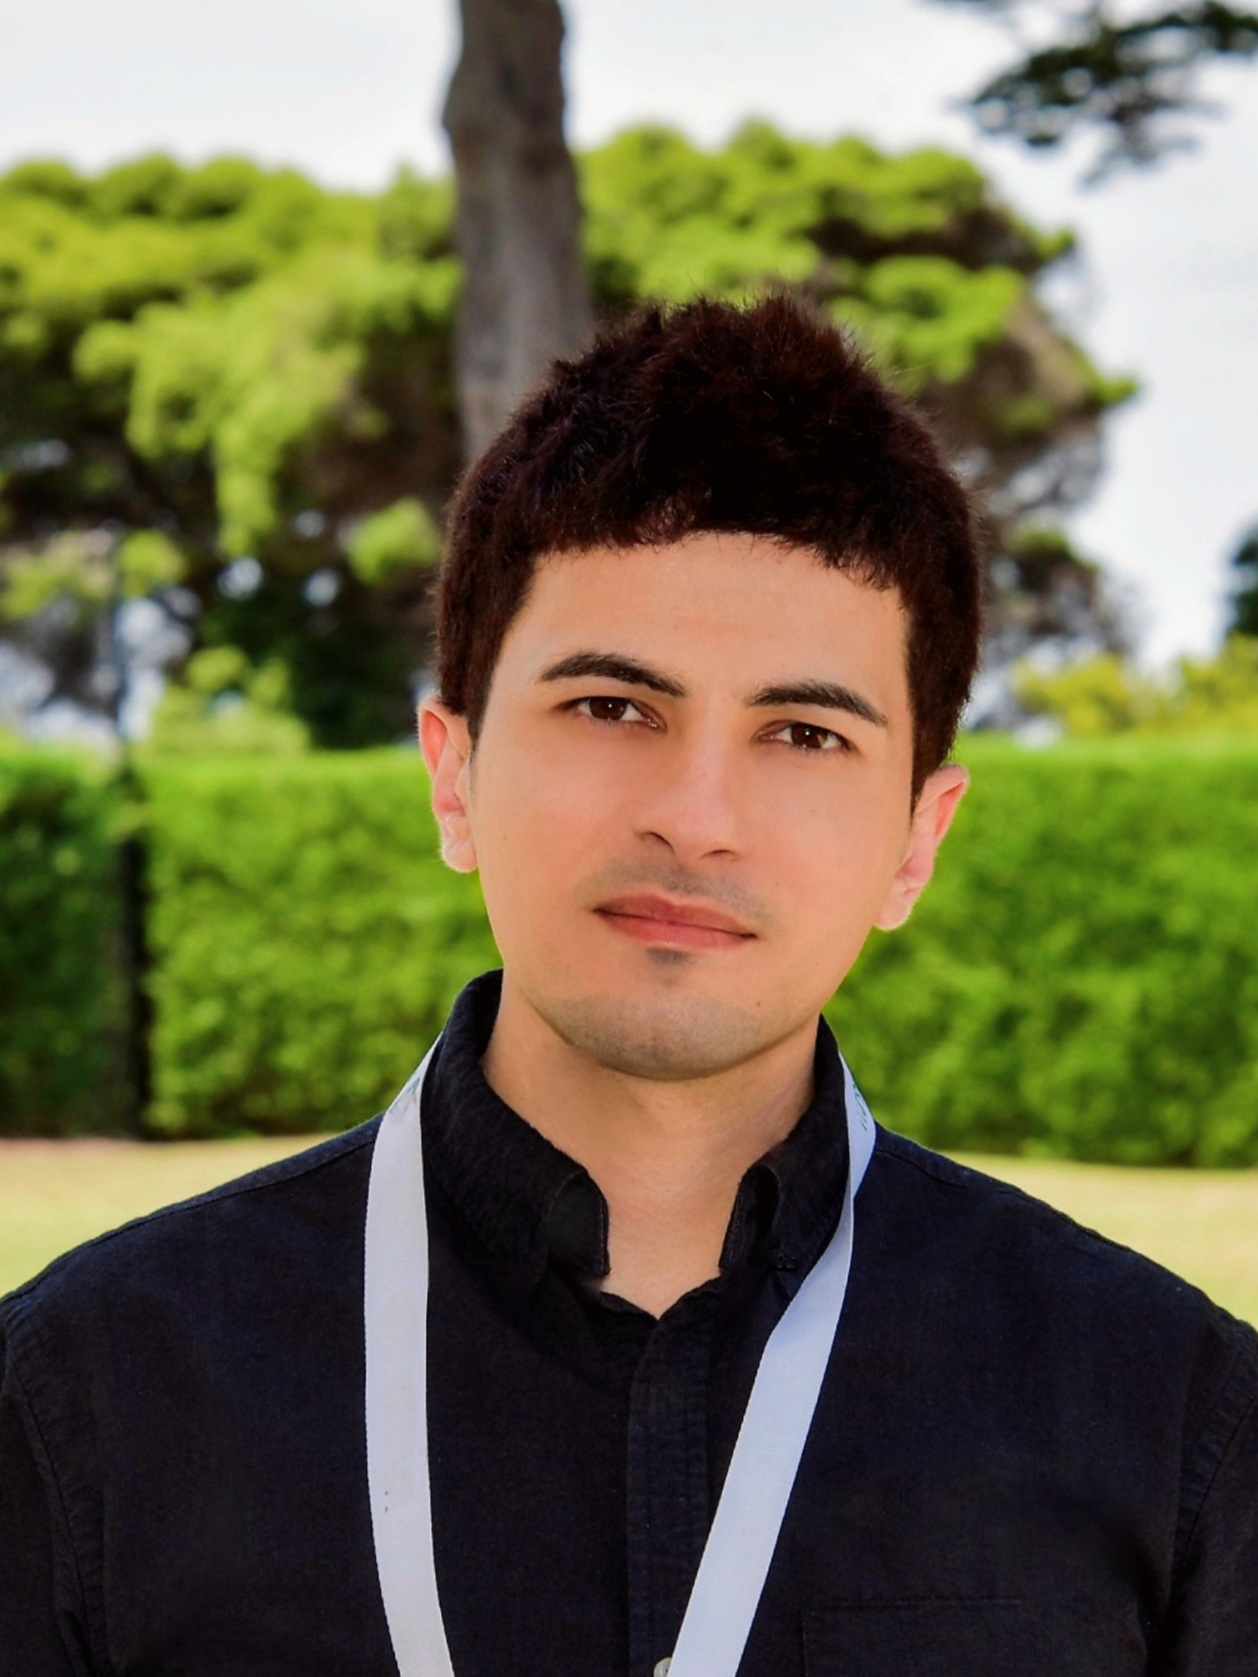 Dr Mohannad Aref Jadallah Mayyas